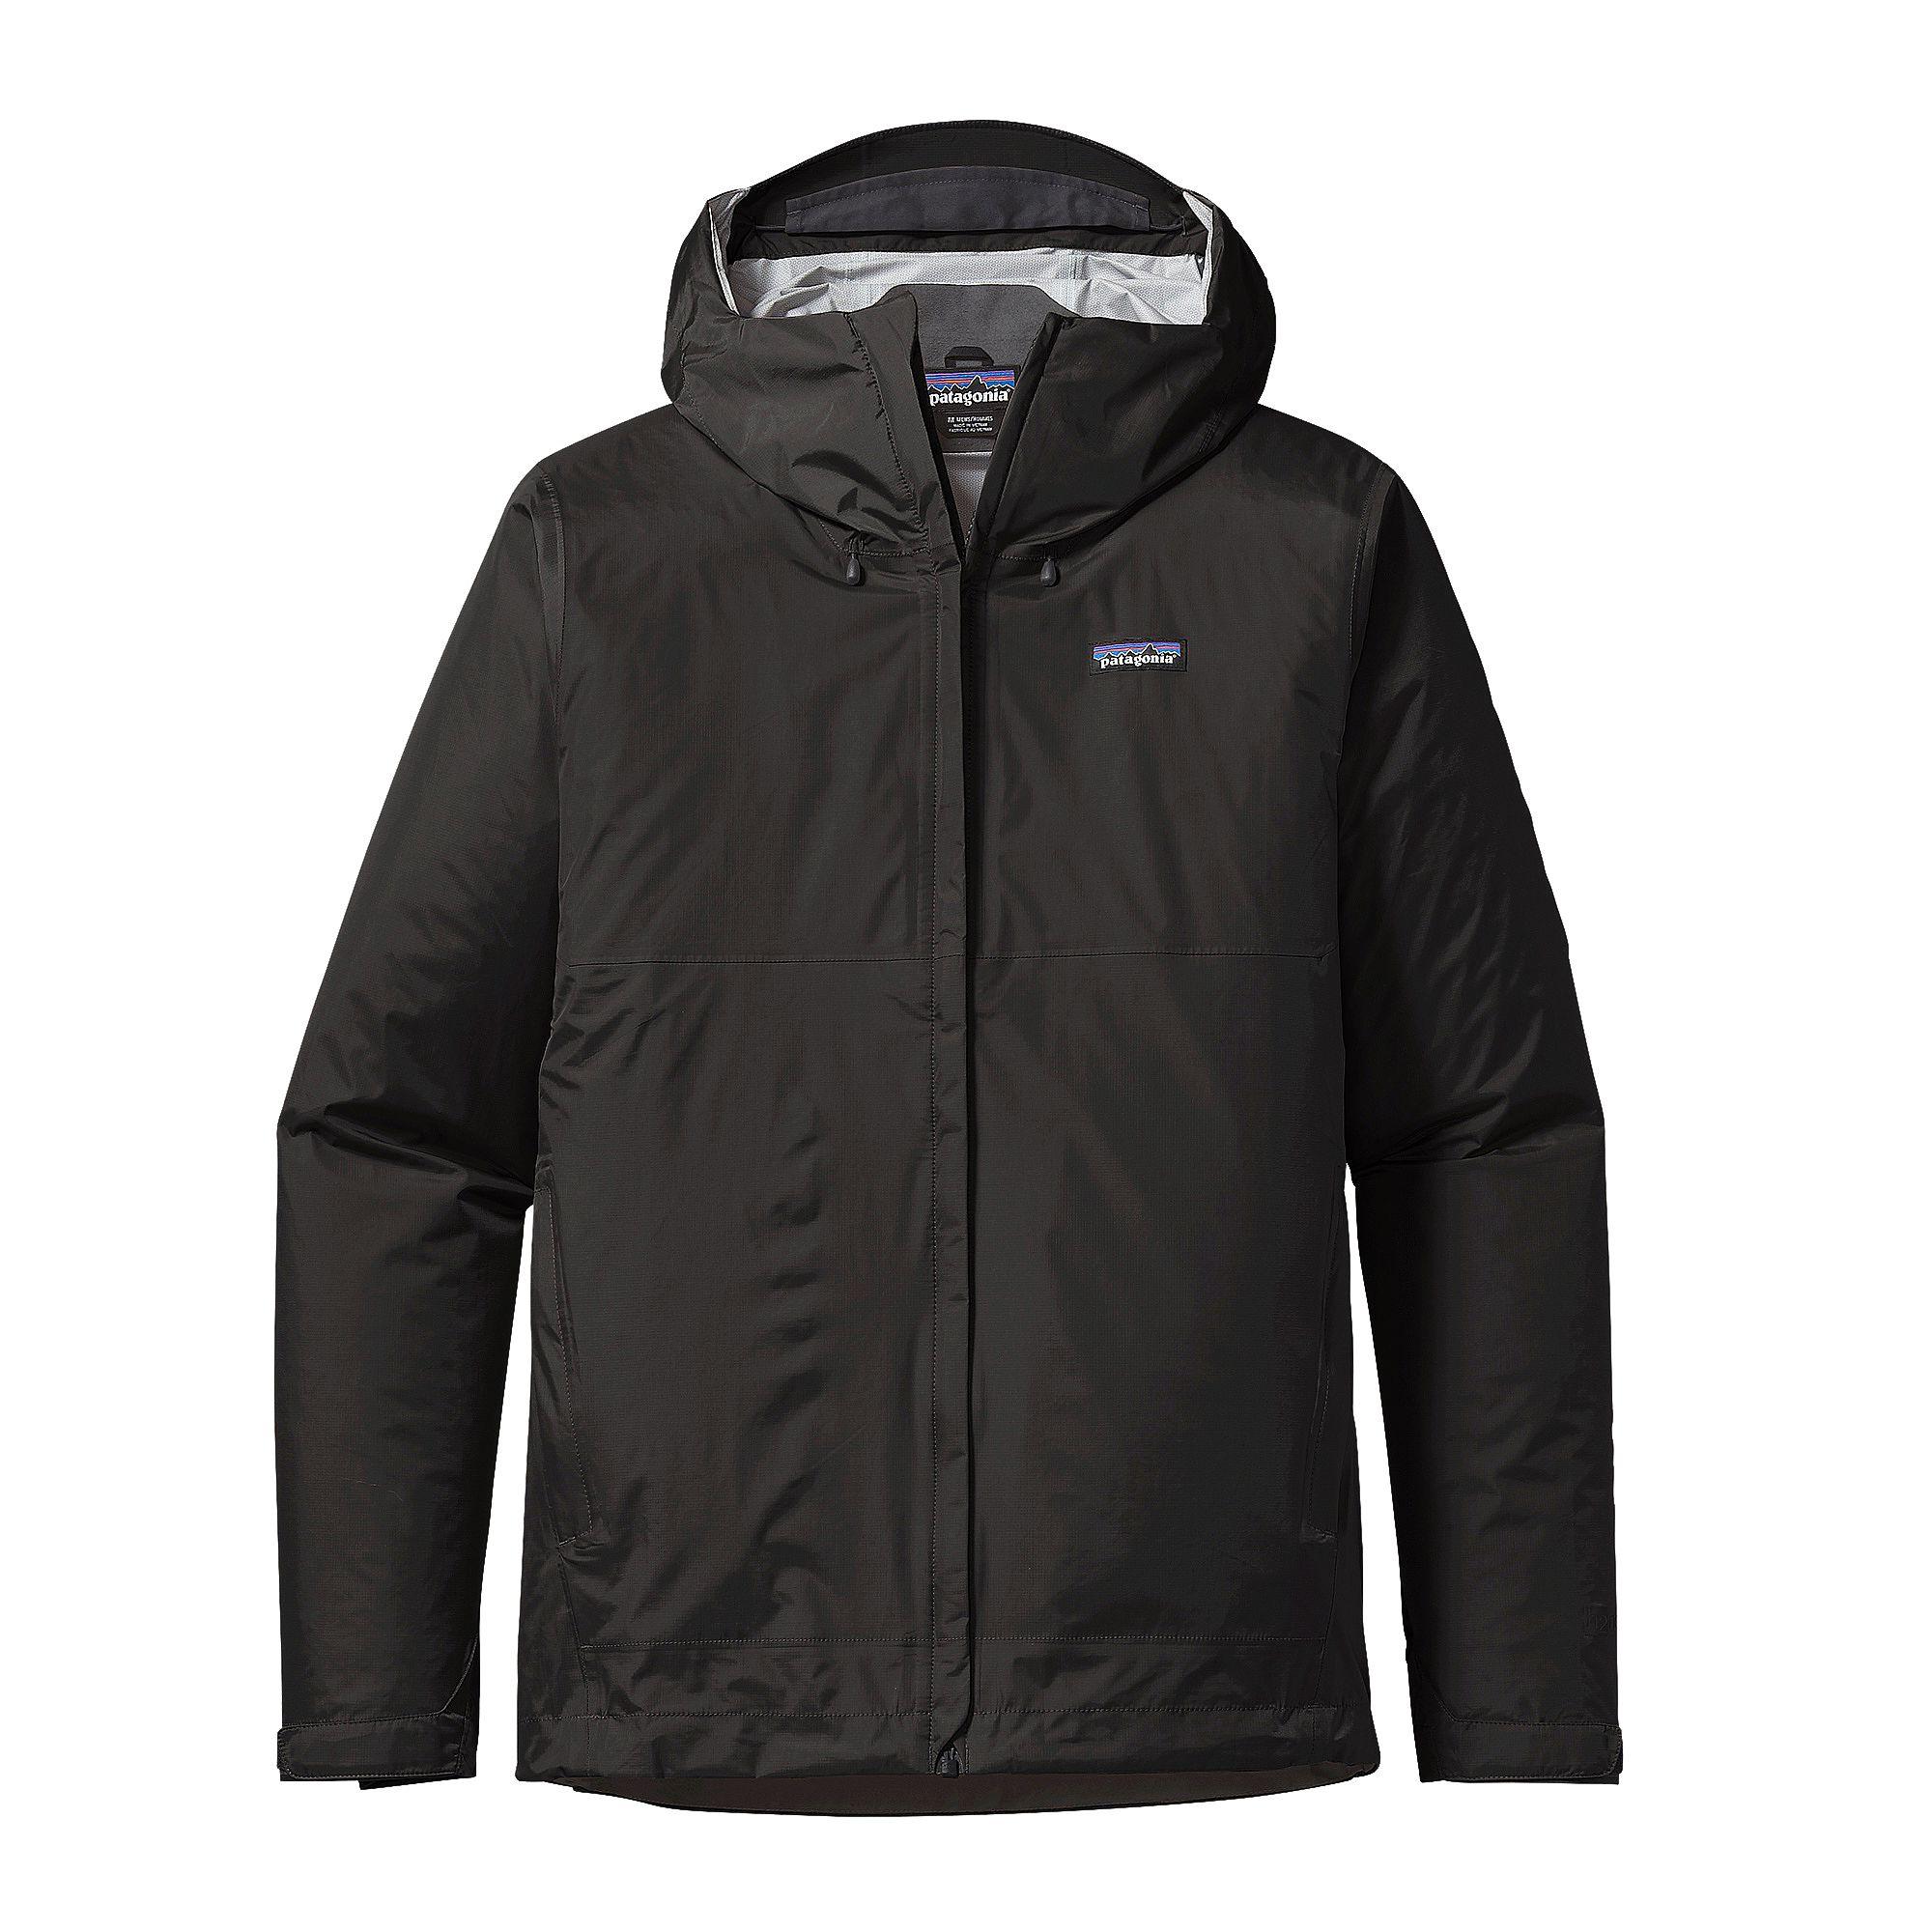 Patagonia - Torrentshell - Hardshell jacket - Men's